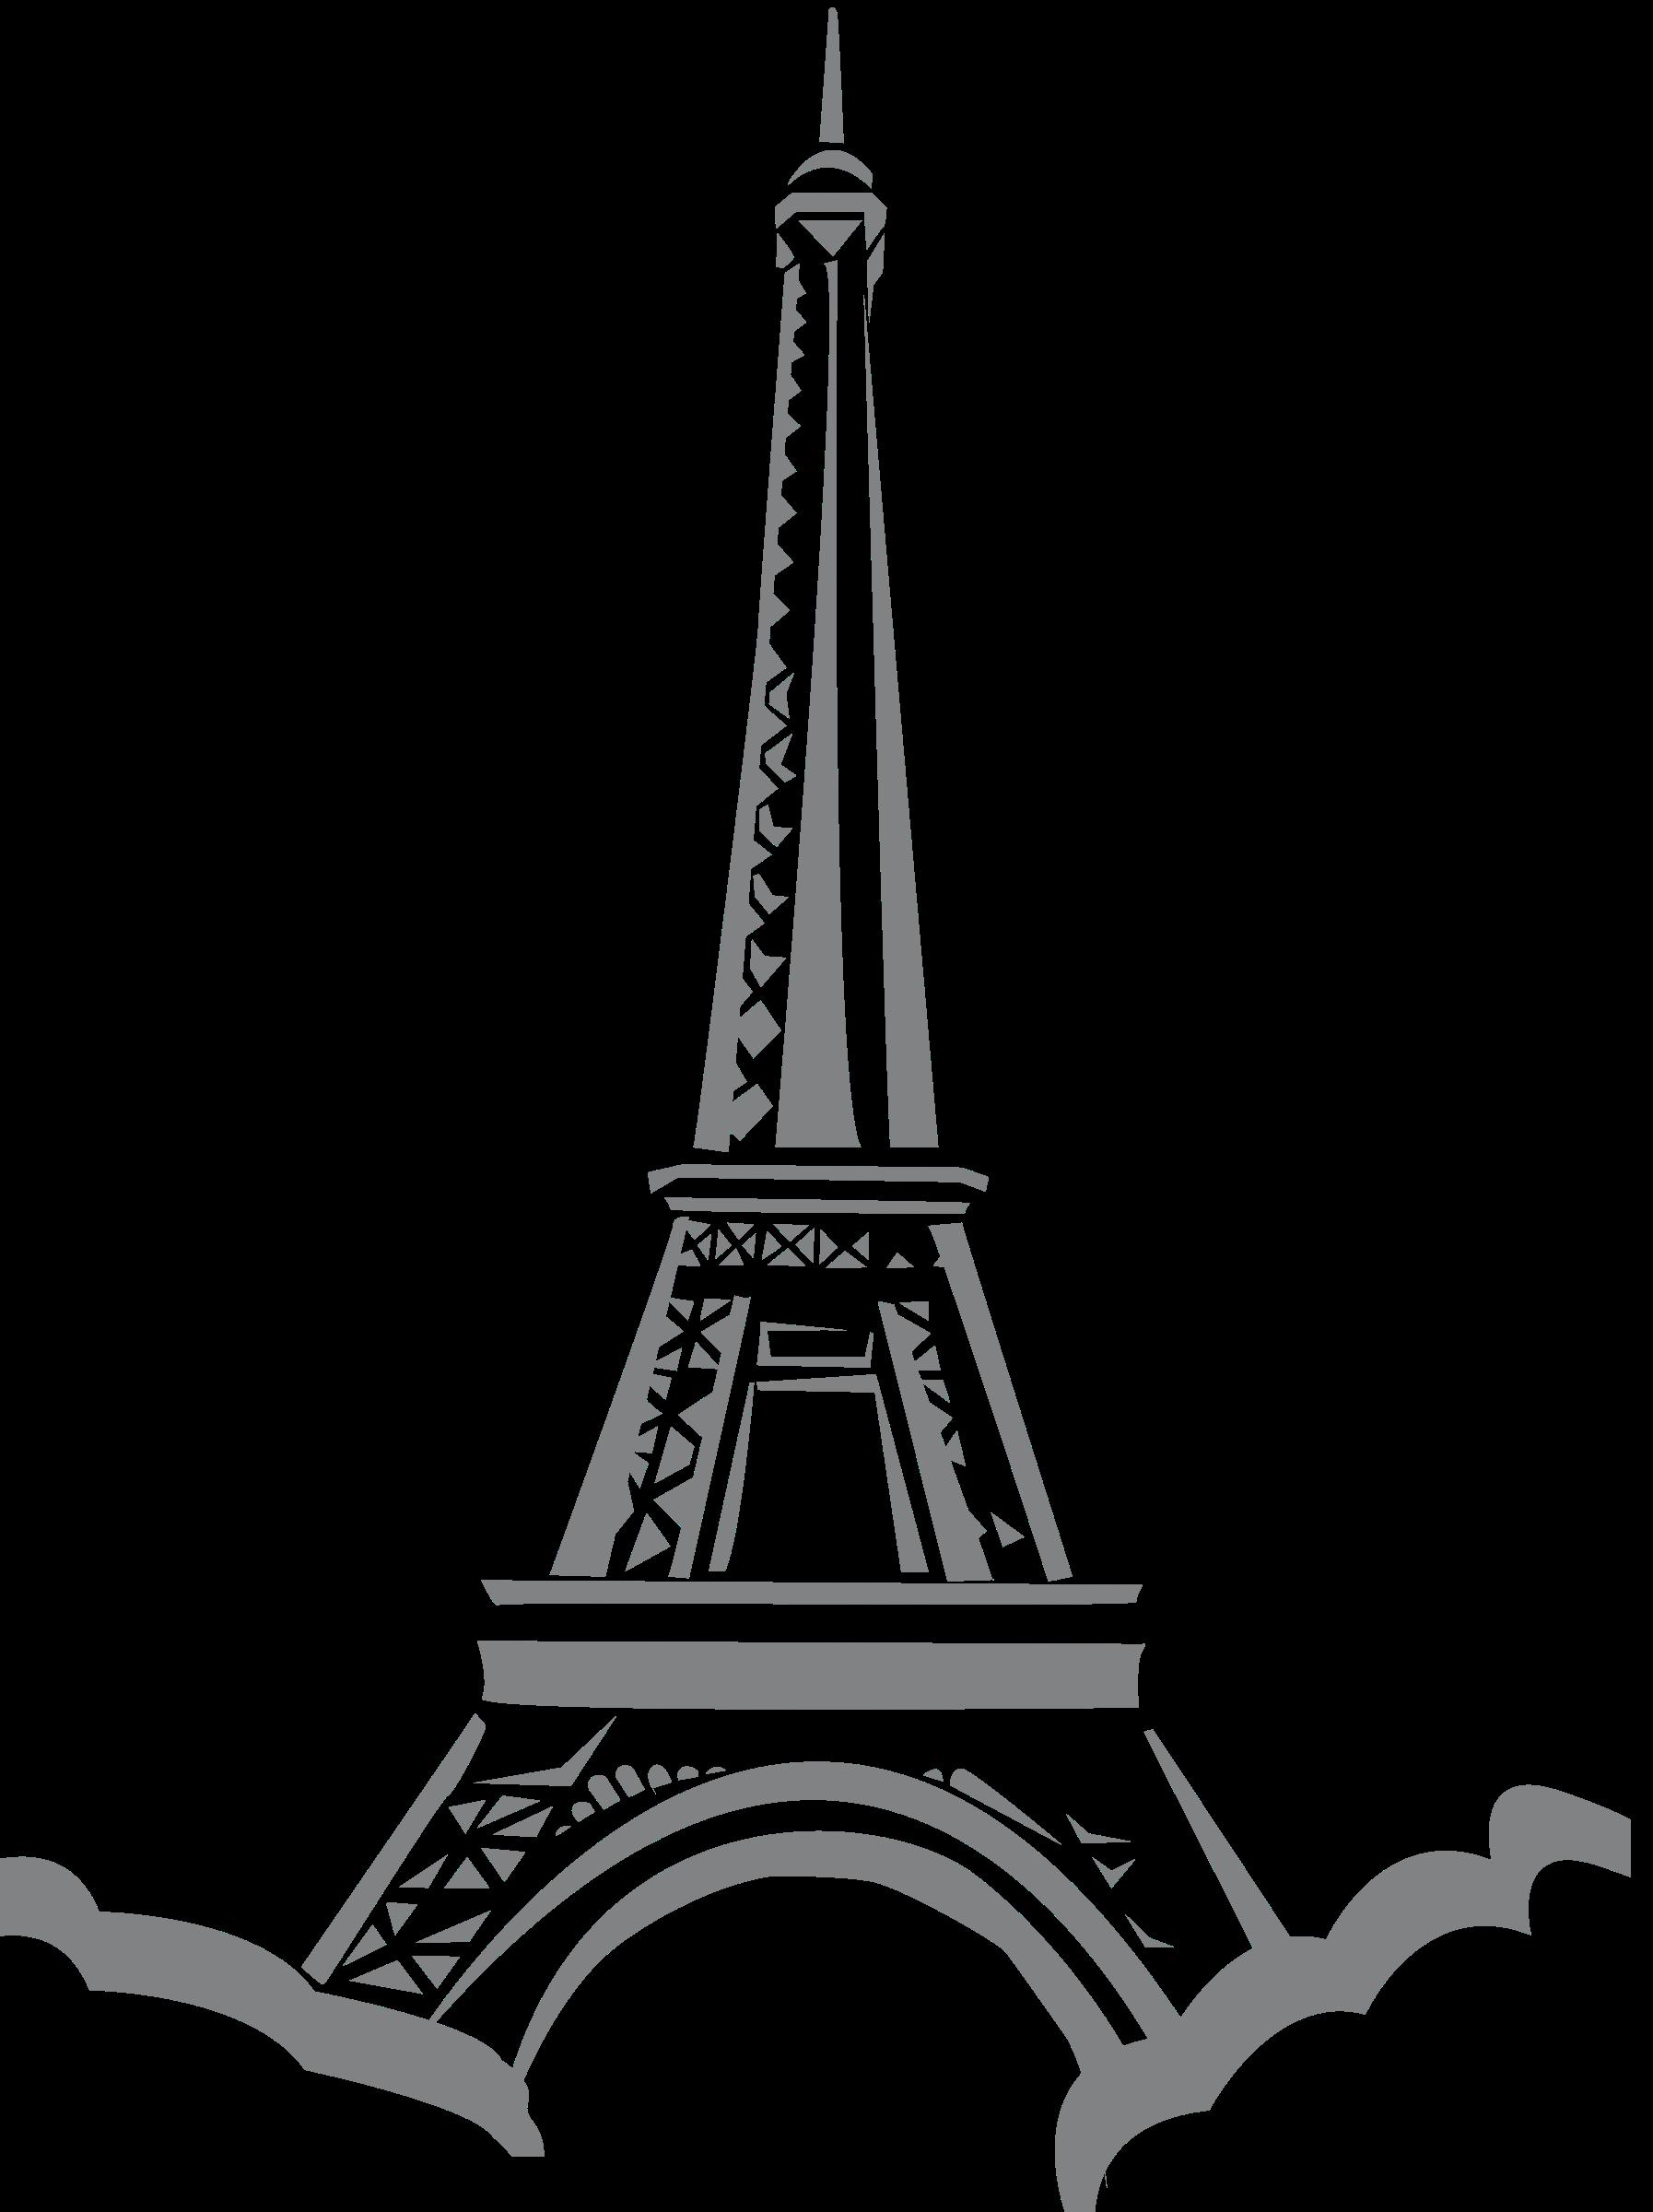 Paris PNG Images Transparent Free Download.